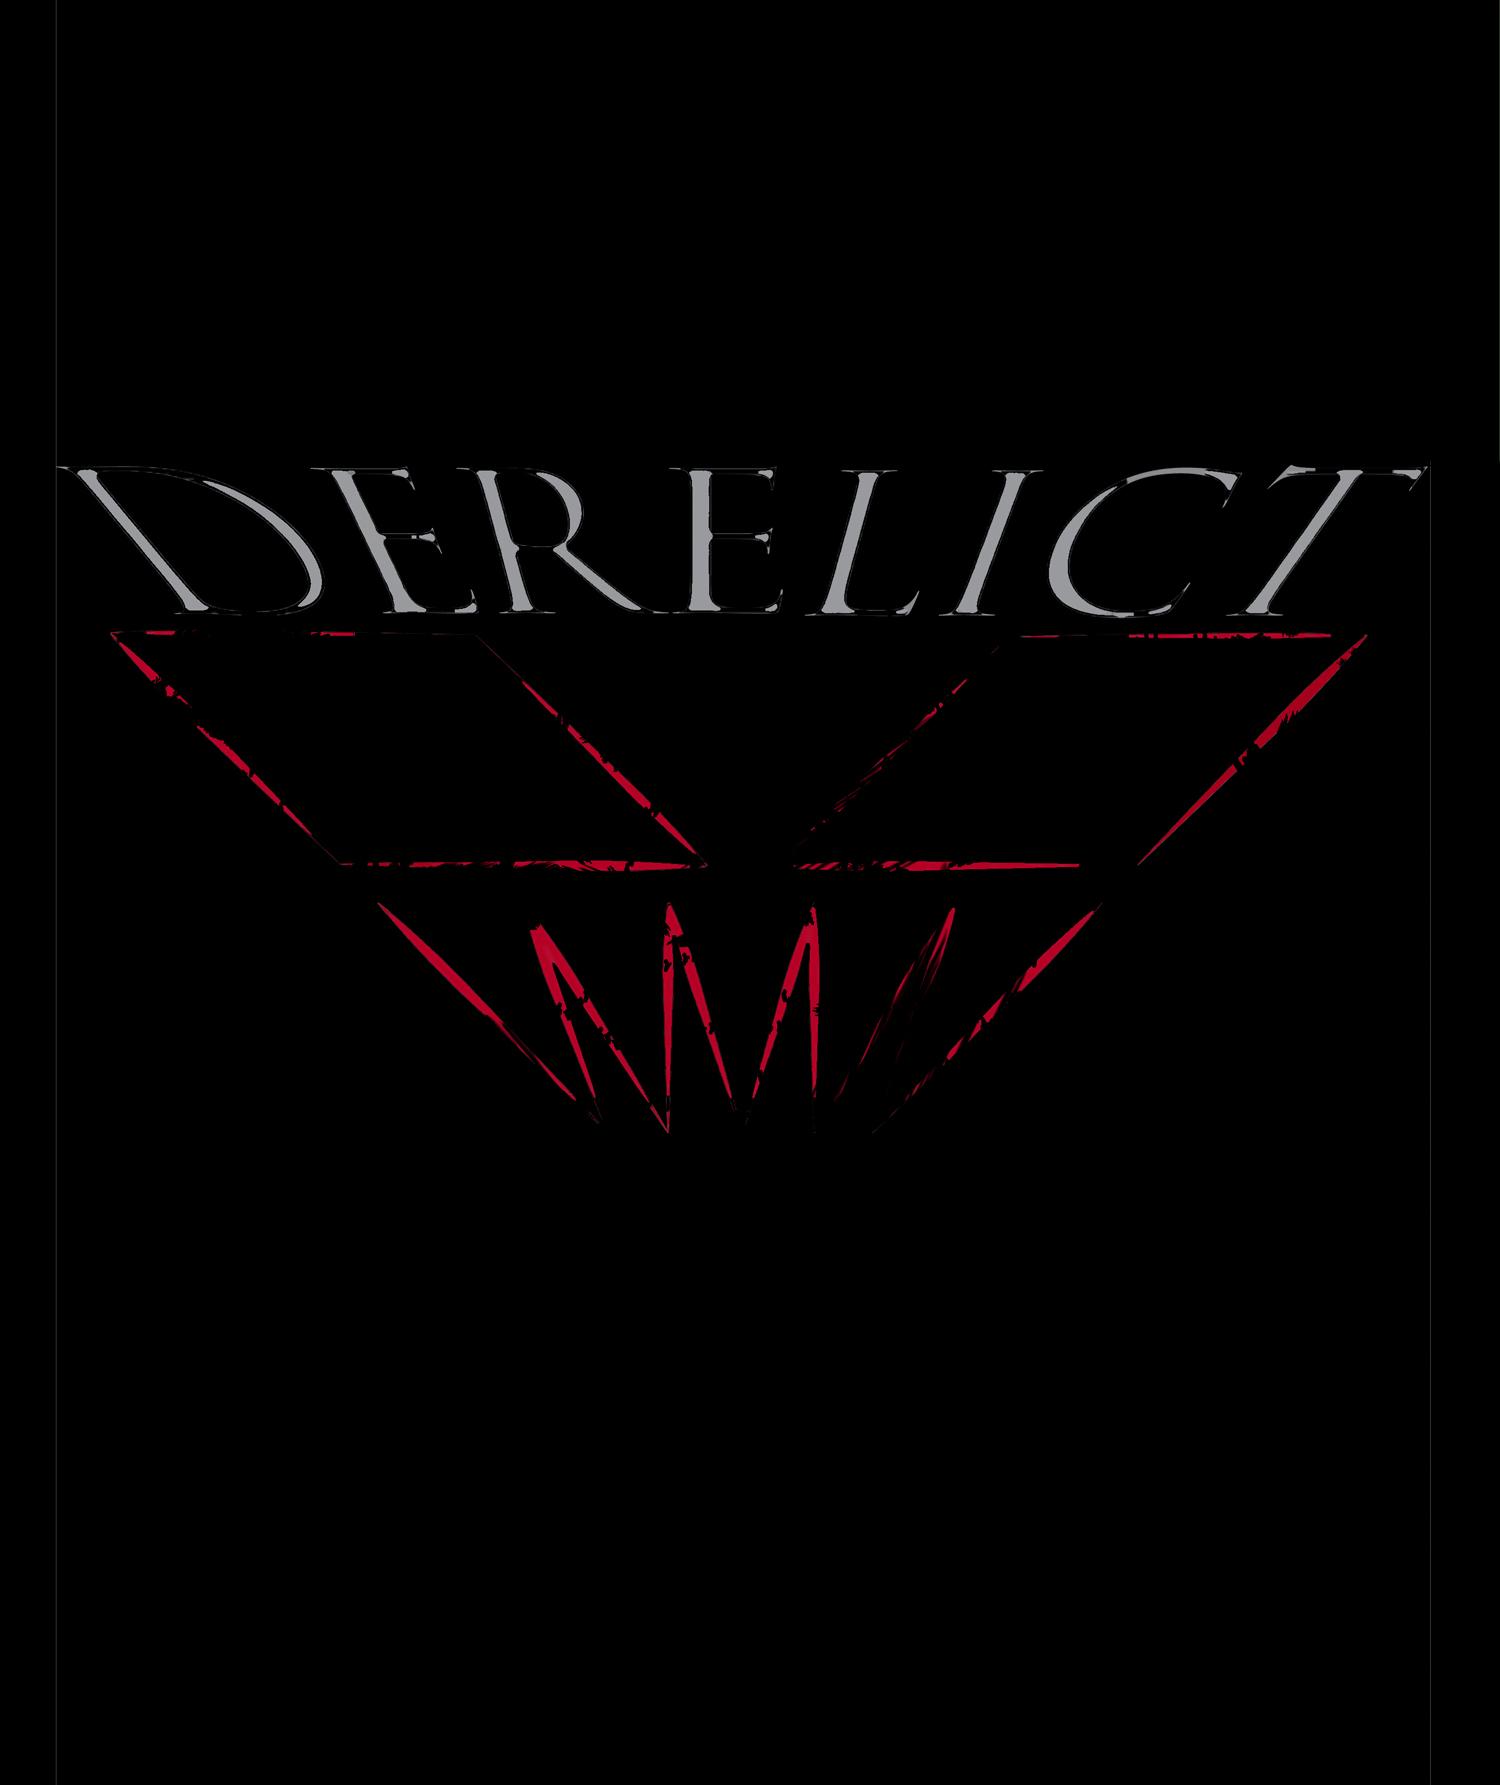 Derelict Poster (Simplistic)